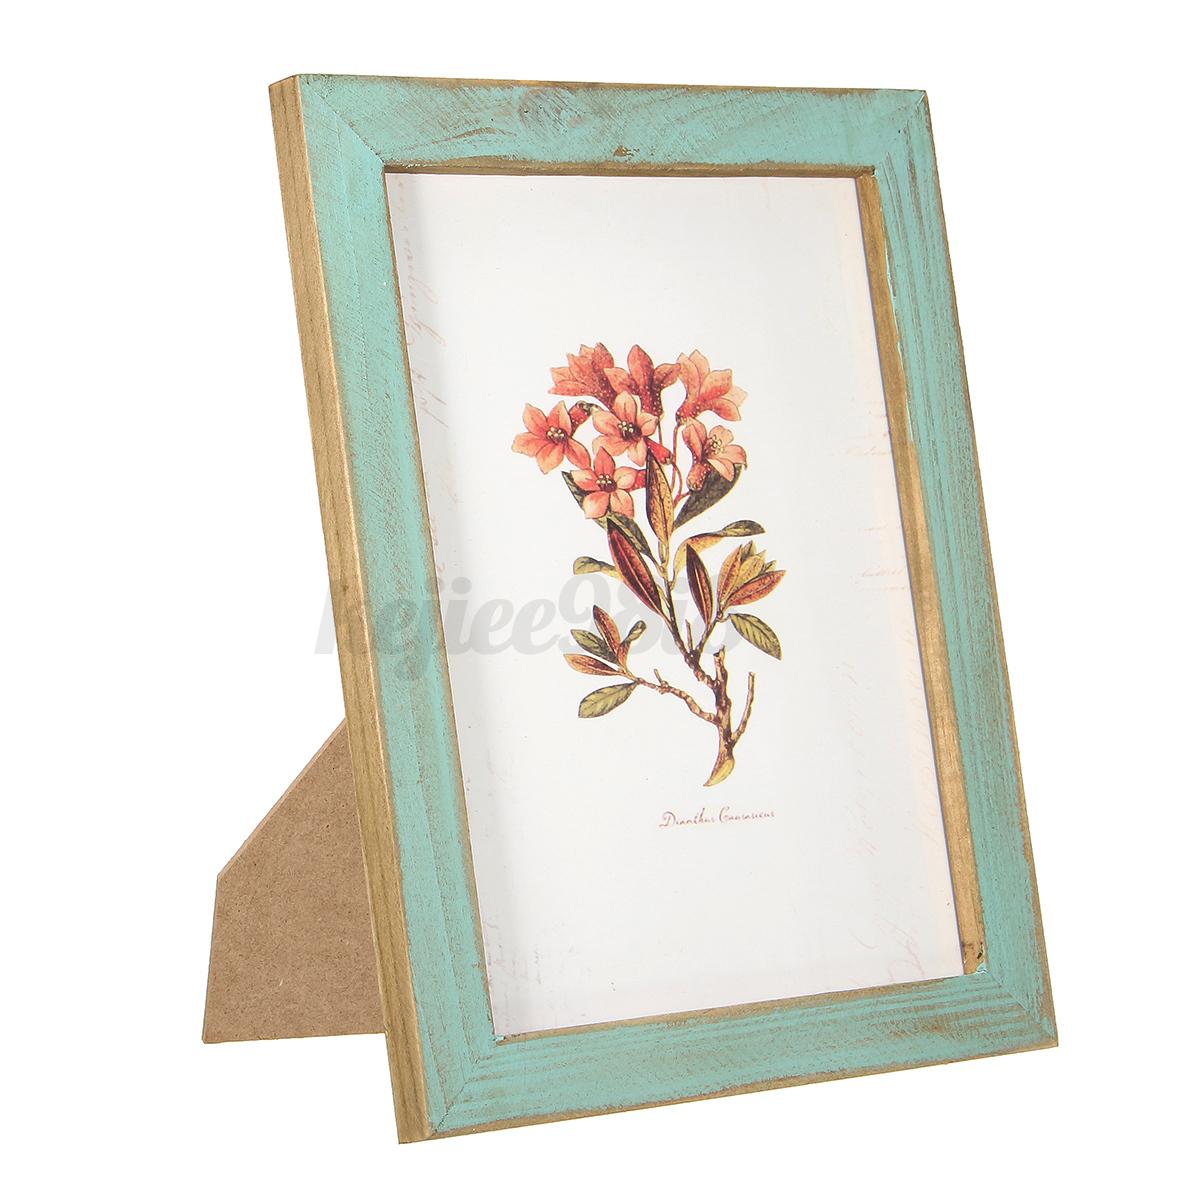 Vintage antique wood photo picture frame shabby desk for Picture frame hanging designs